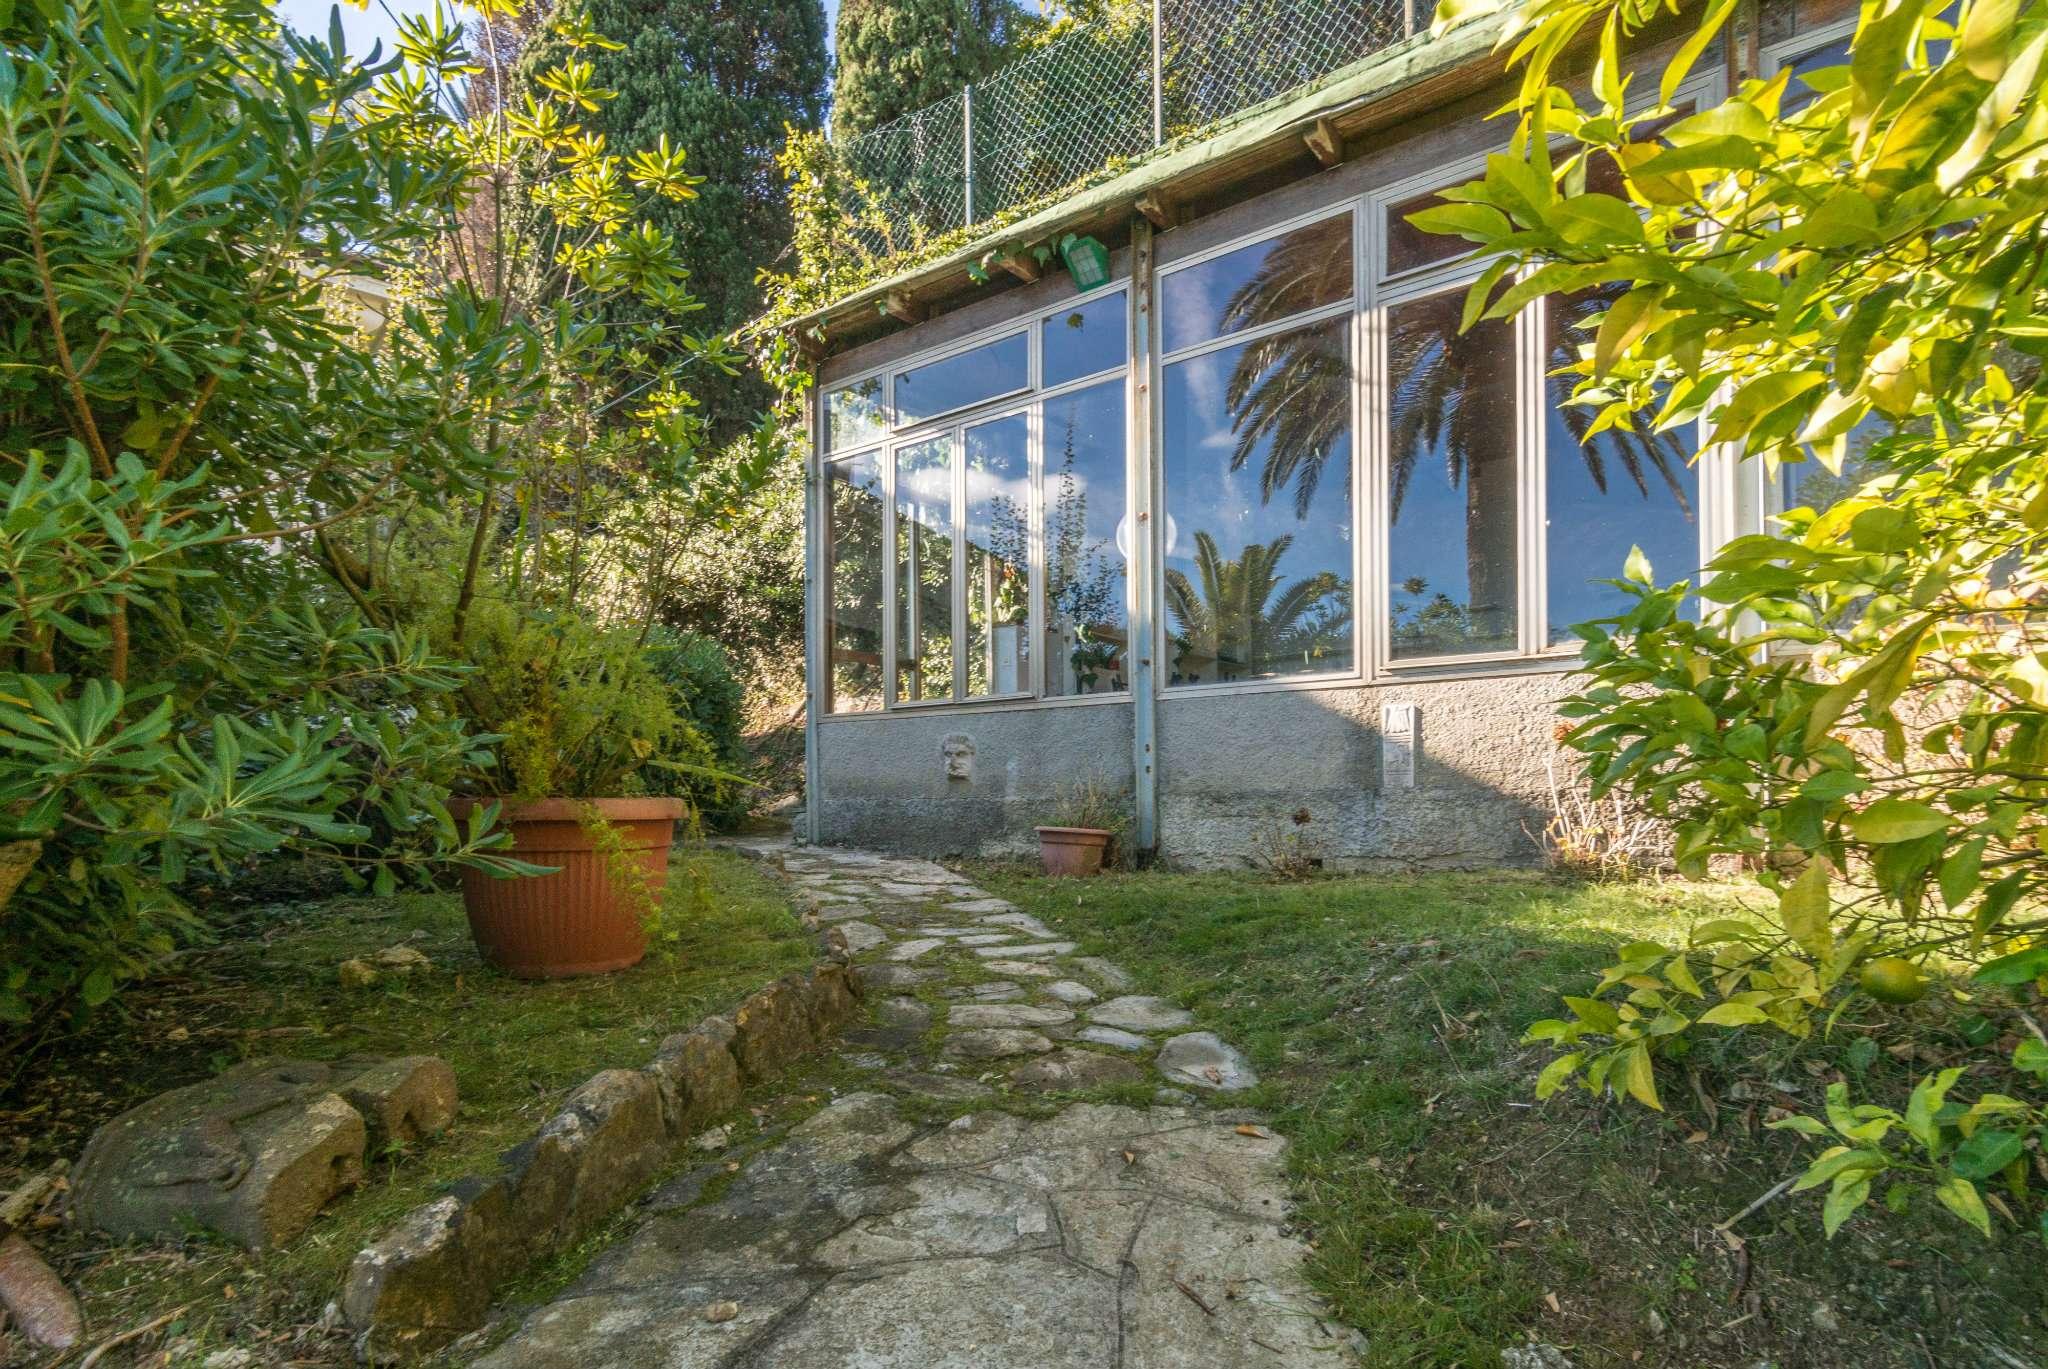 Villa in Vendita a Santa Margherita Ligure: 5 locali, 545 mq - Foto 20